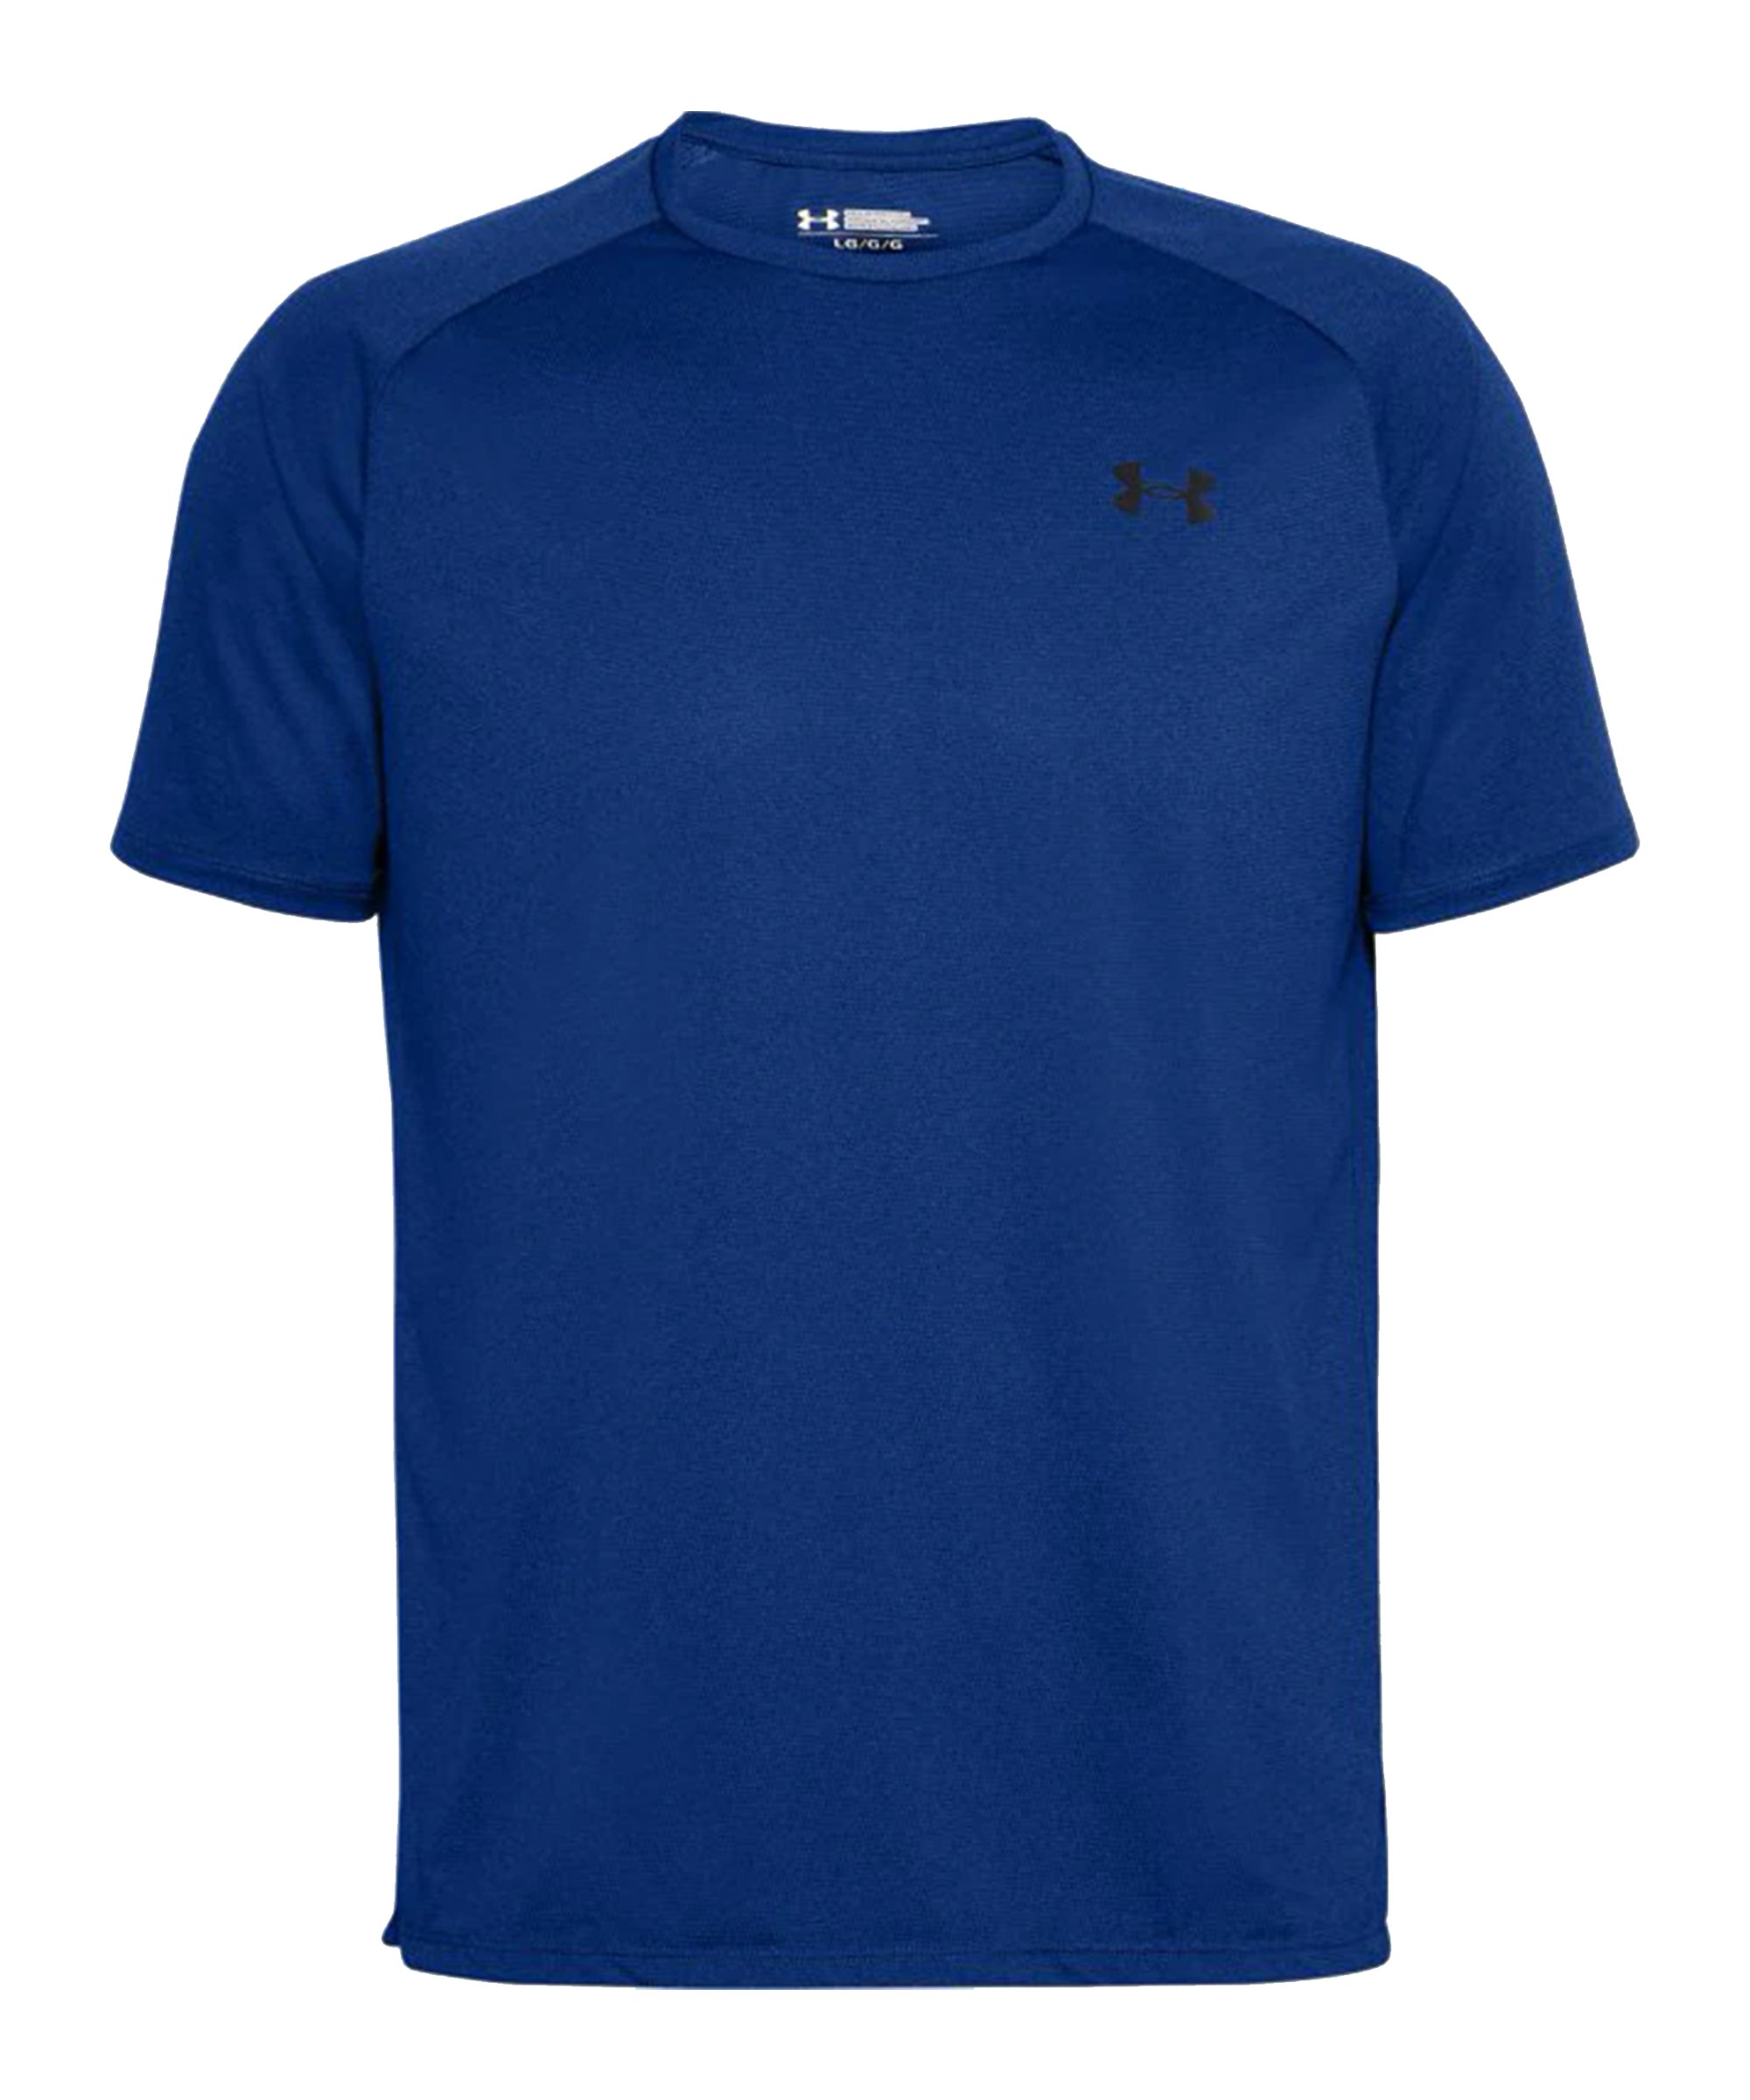 Under Armour Tech 2.0 T-Shirt Blau F400 - blau